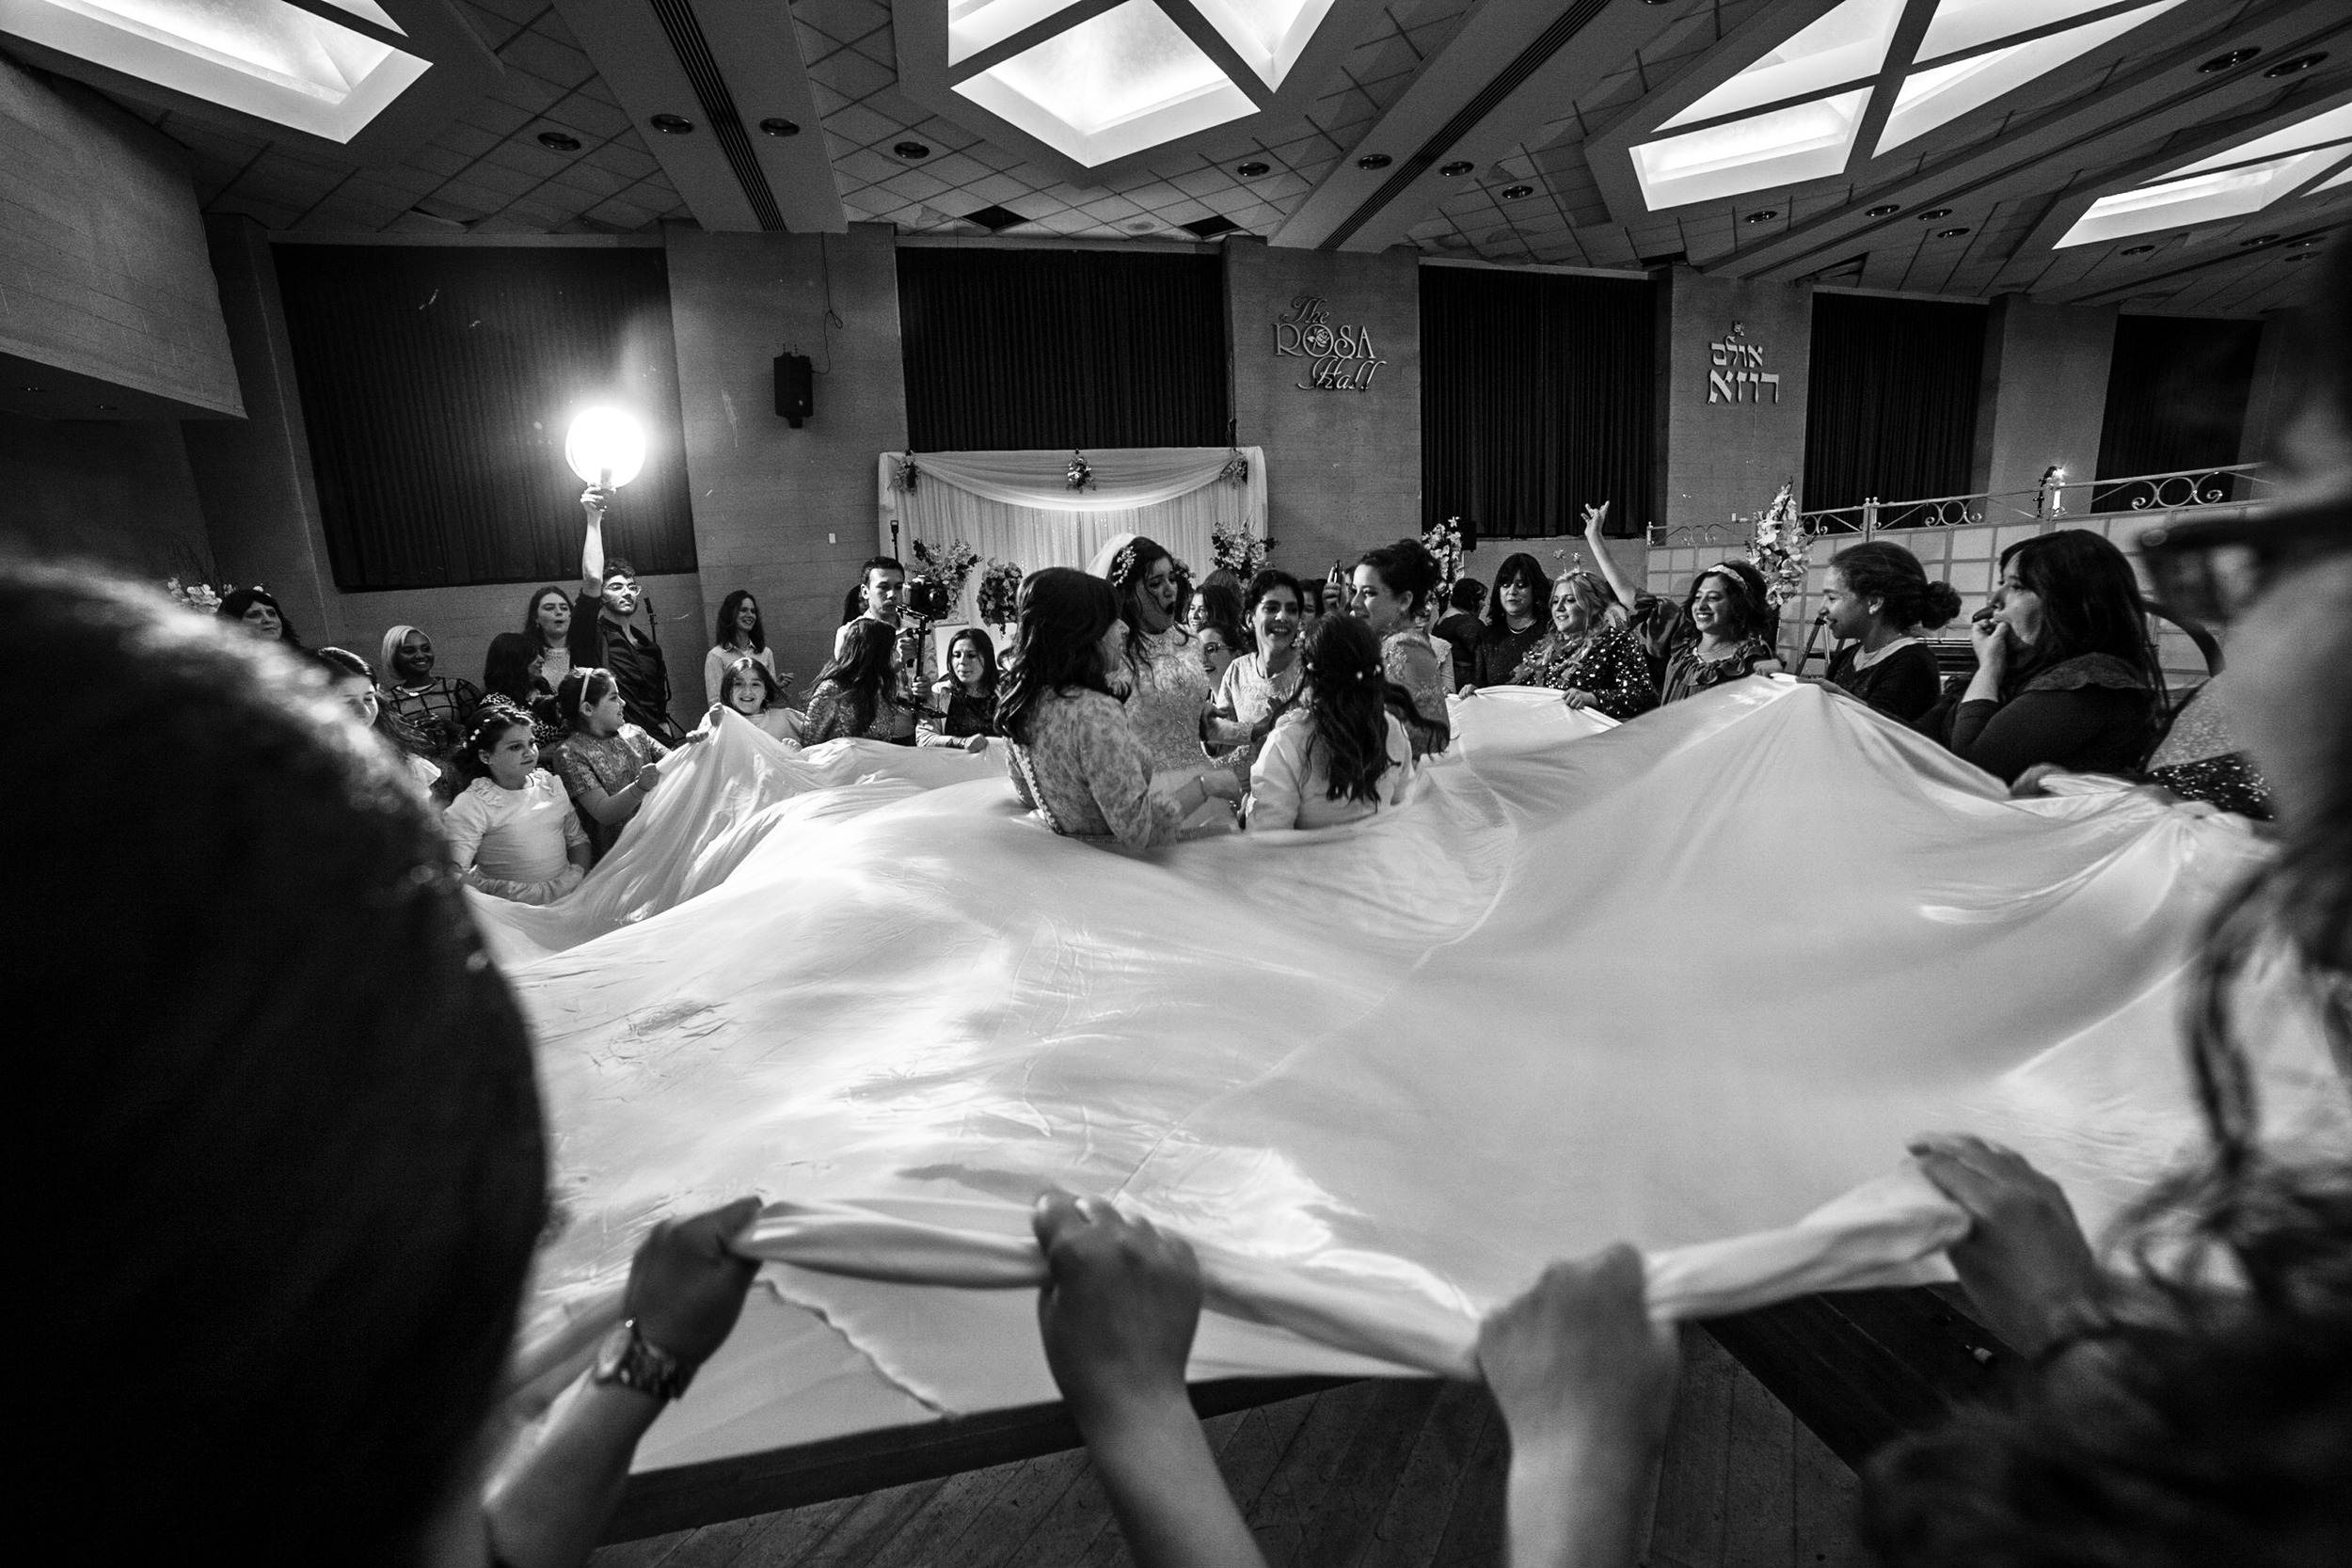 Wedding Iossi and Gitty Khafif  - Eliau Piha studio photography, new york, events, people 770 brooklyn -1036.jpg